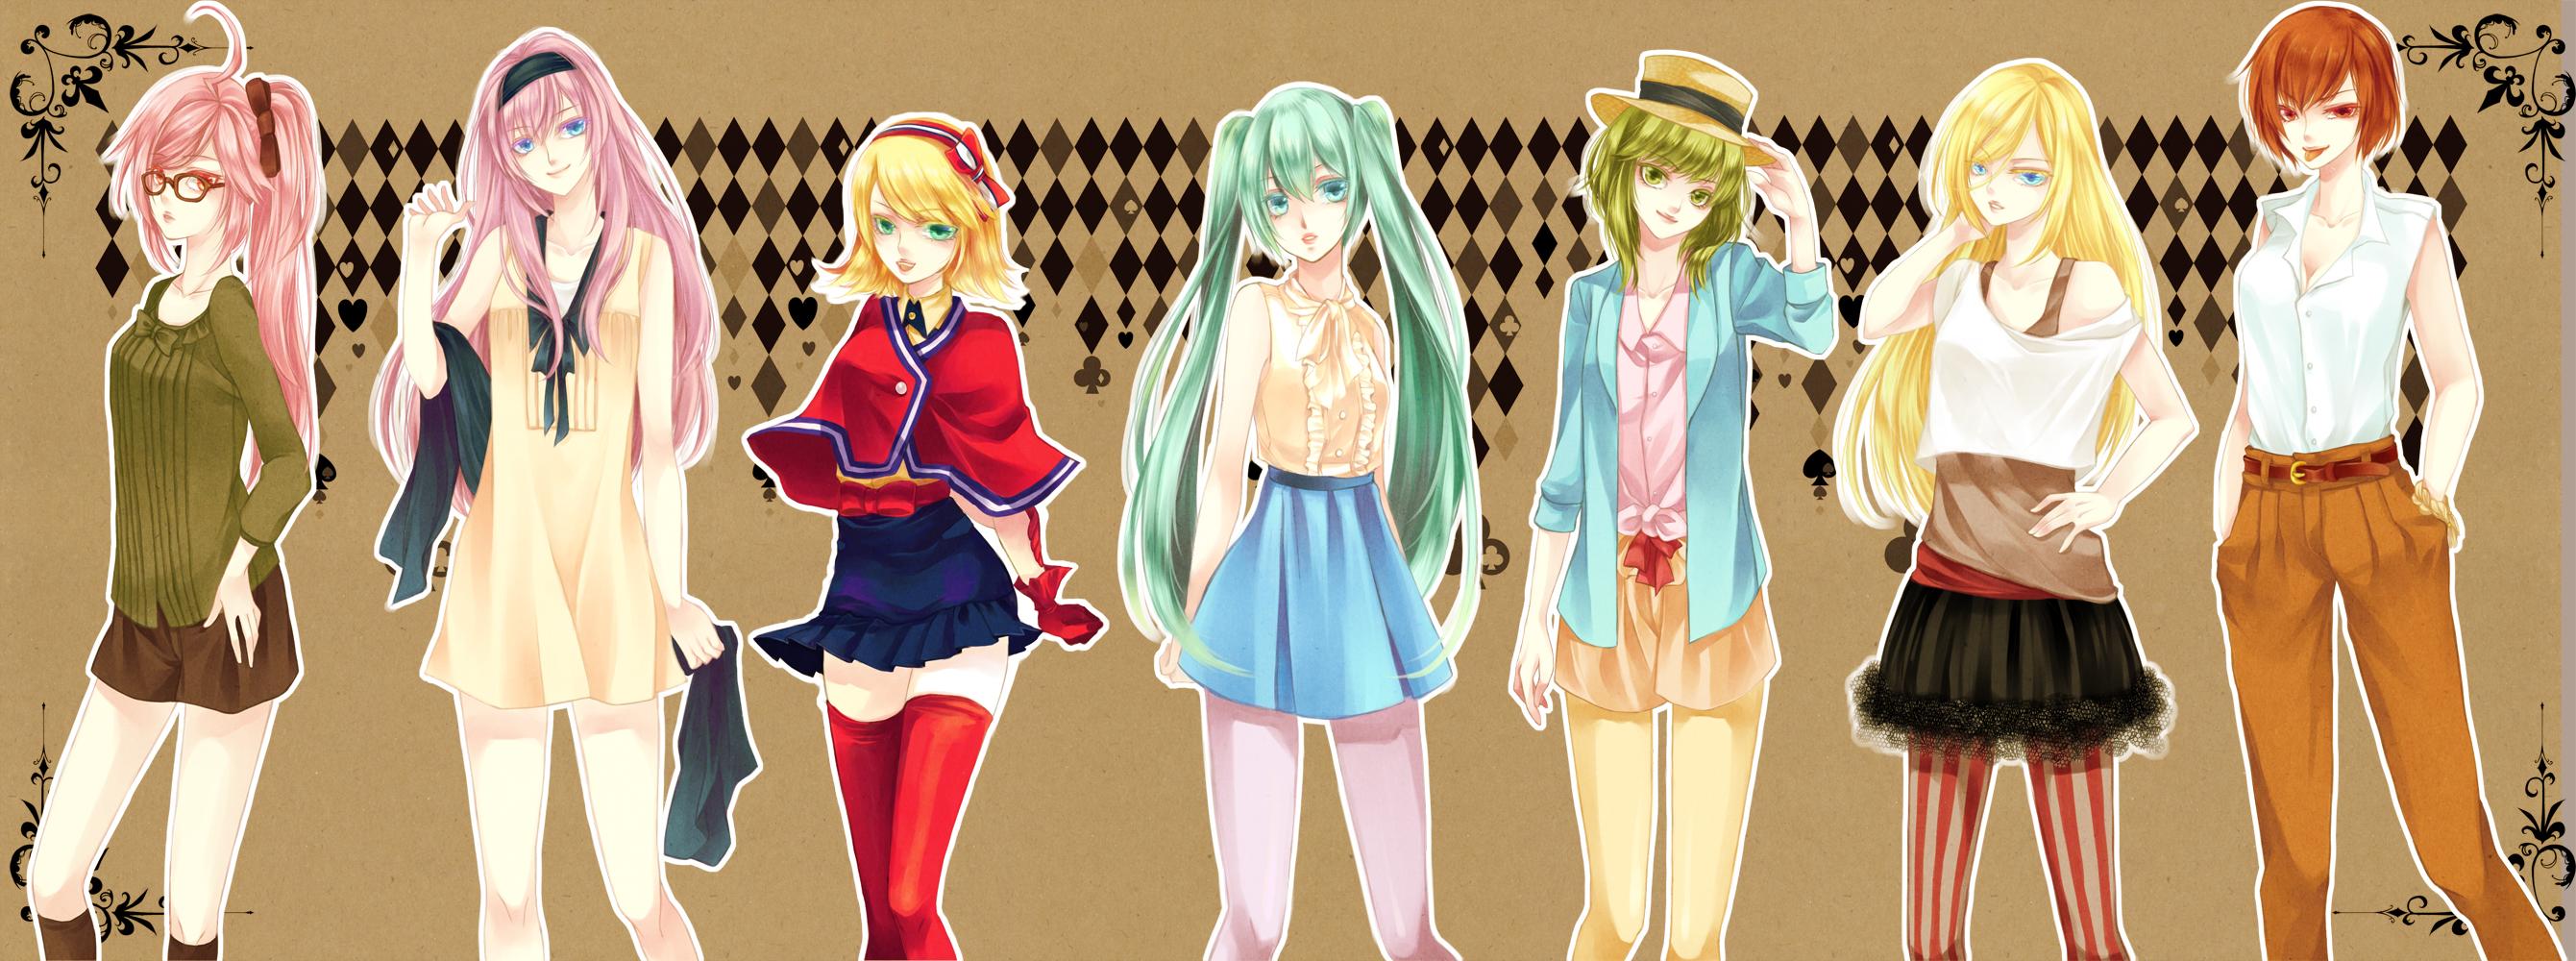 hatsune miku wallpaper outfits - photo #24